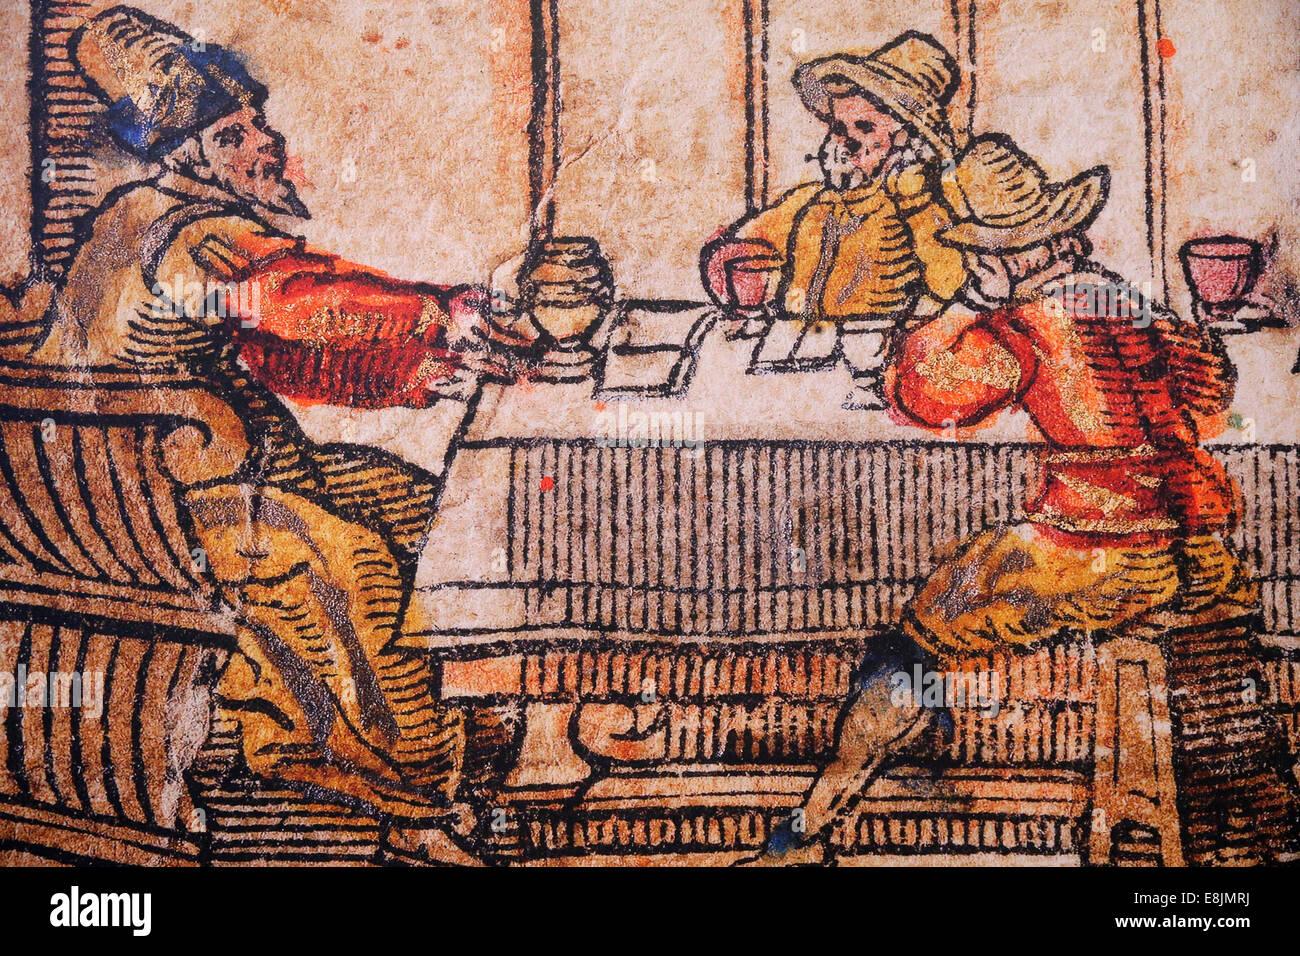 The Israel Museum. Seder night, Venice Haggadah, Italy, 1609. - Stock Image